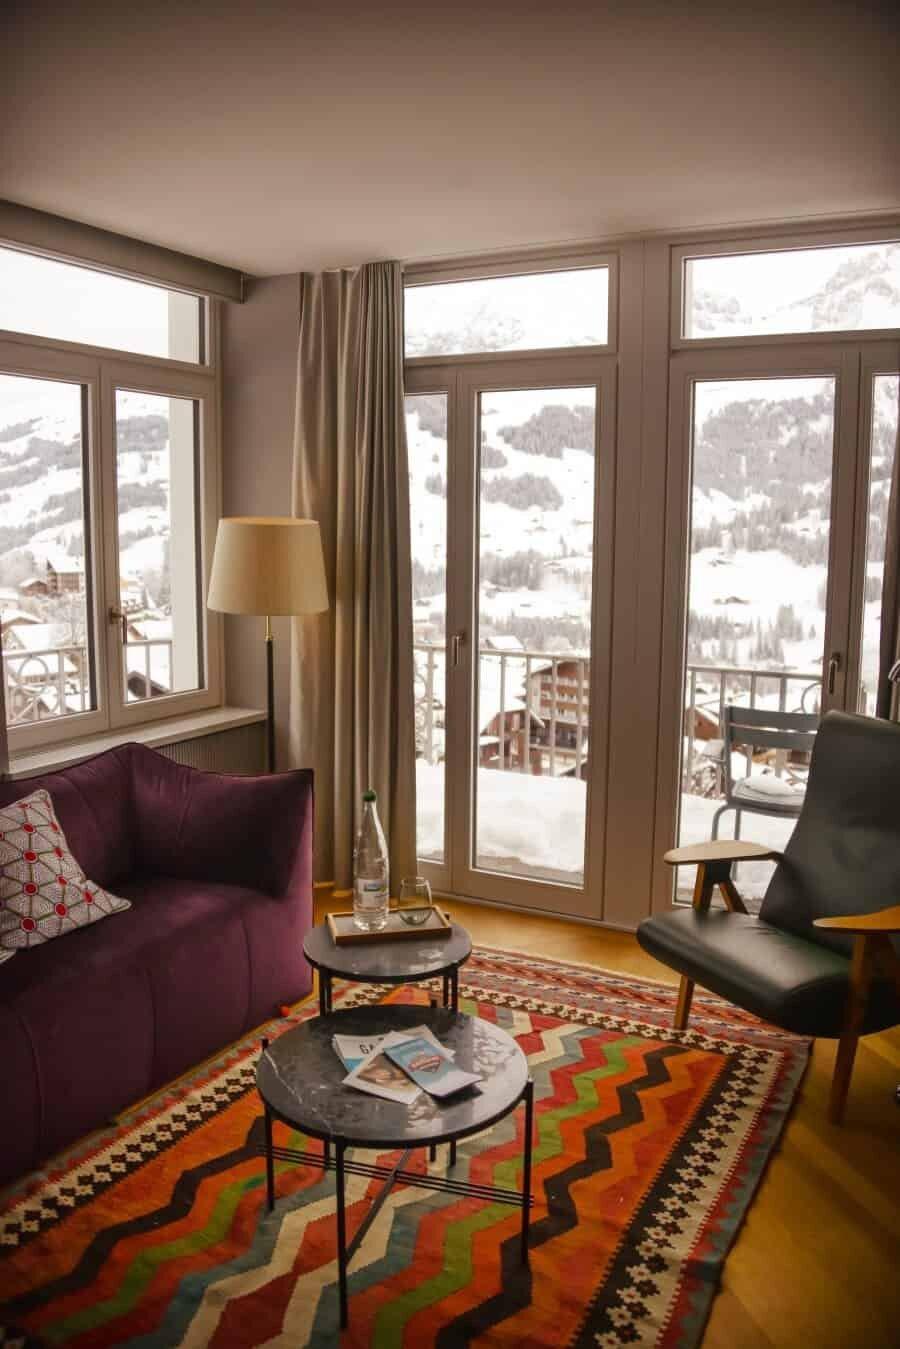 Adelboden Switzerland by The Wandering Lens (2)